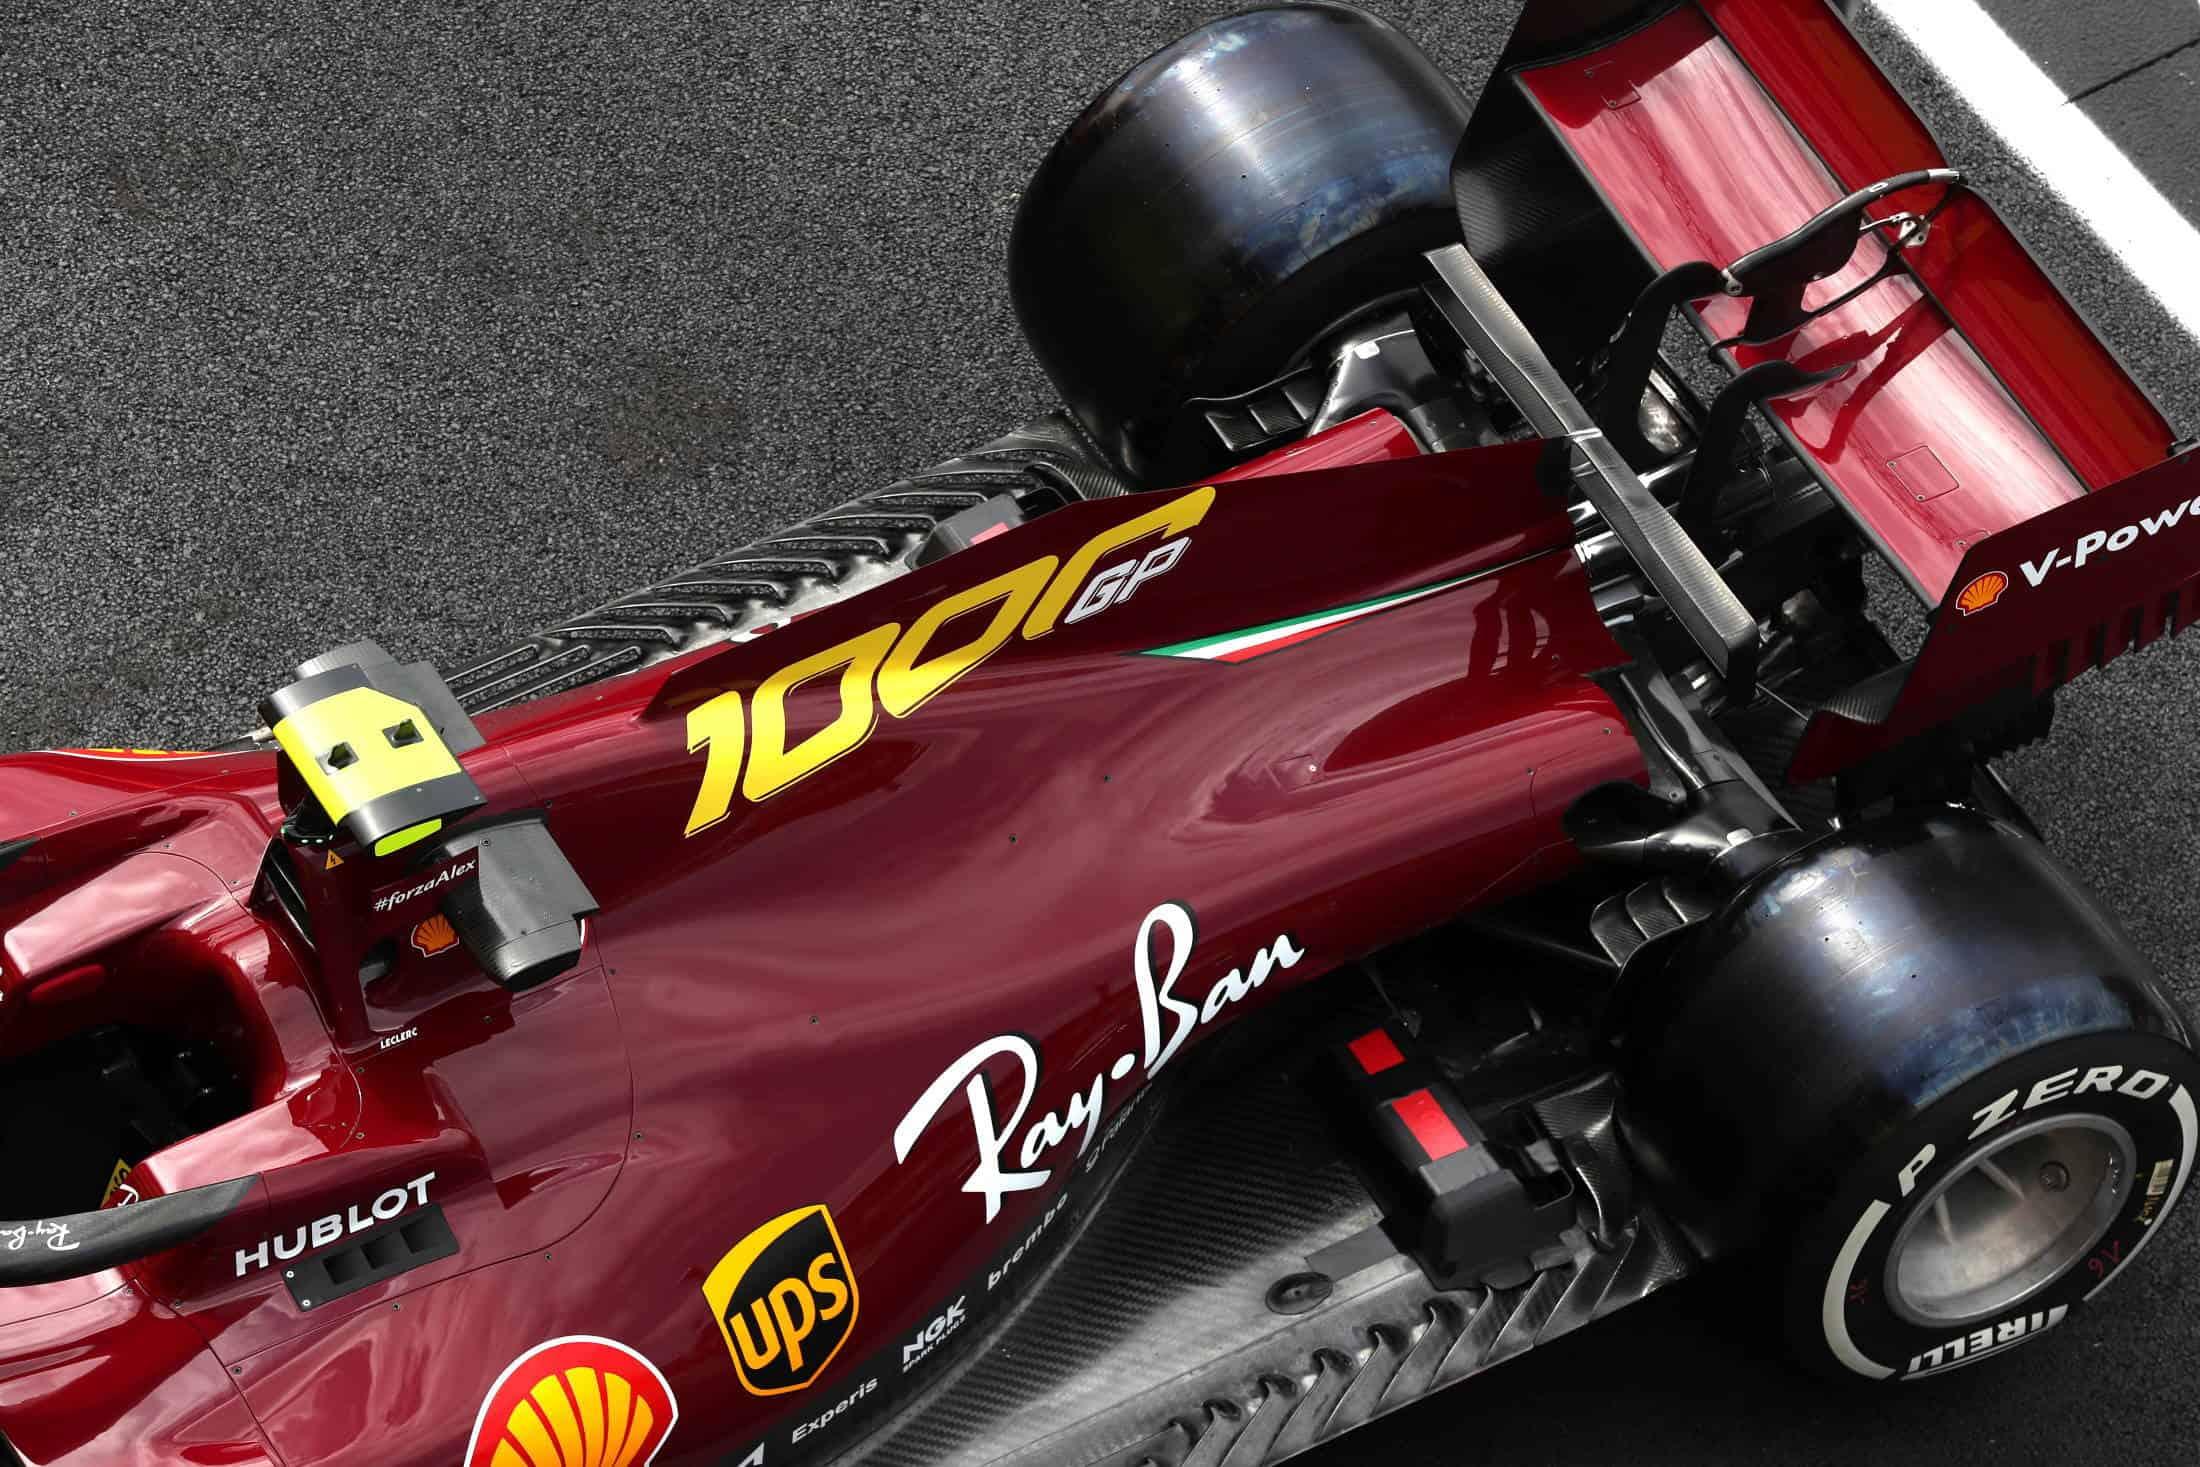 2020 Tuscan GP Ferrari SF1000 special livery on track Thursday Photo Ferrari